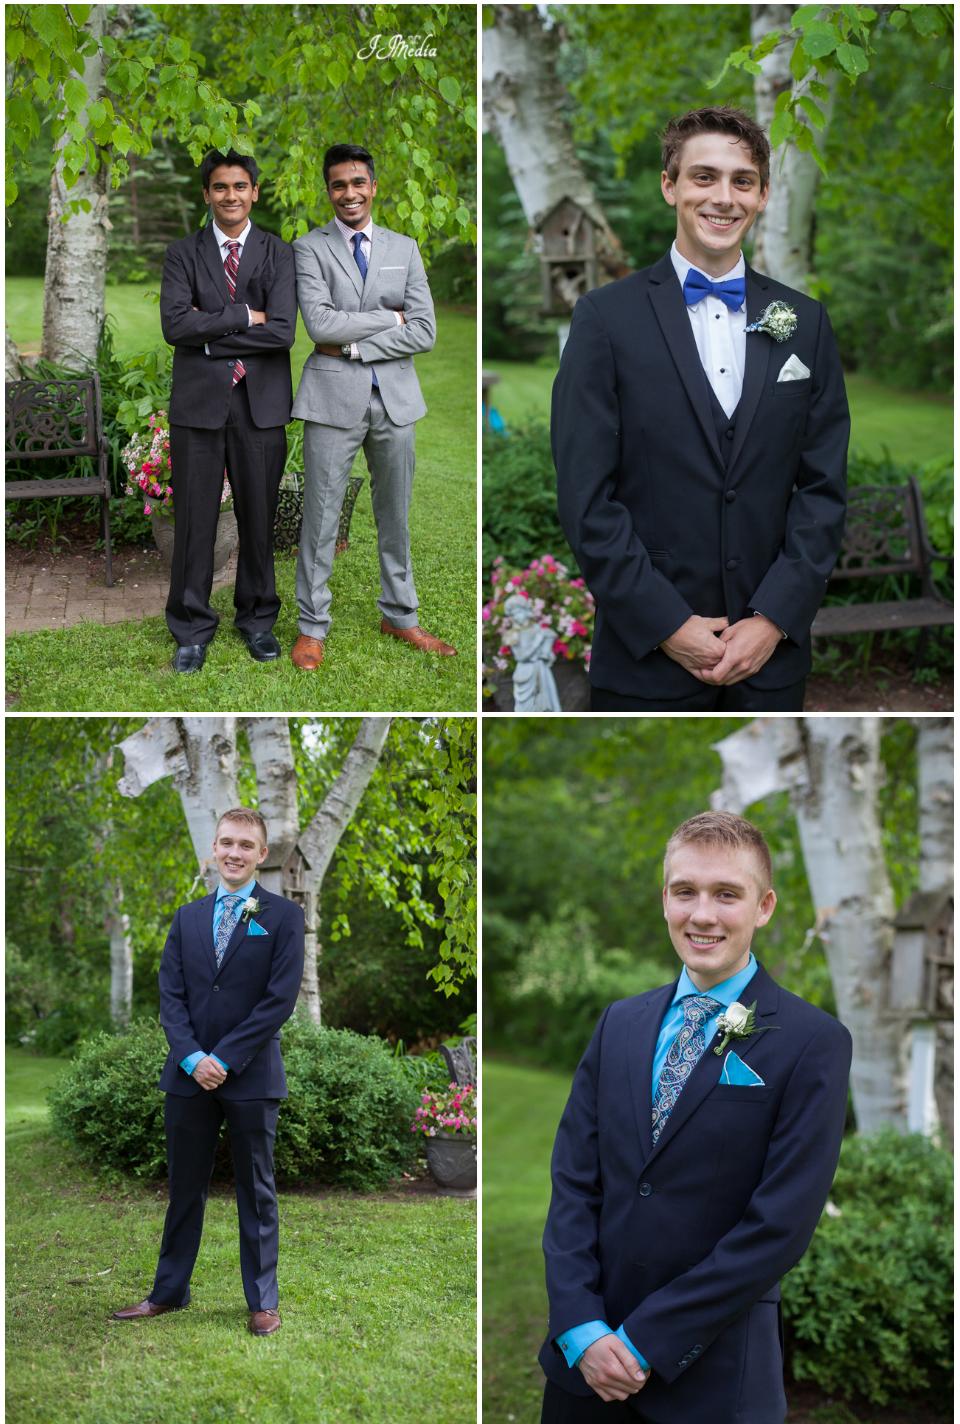 Whitby-Prom-Photos-JJMedia9